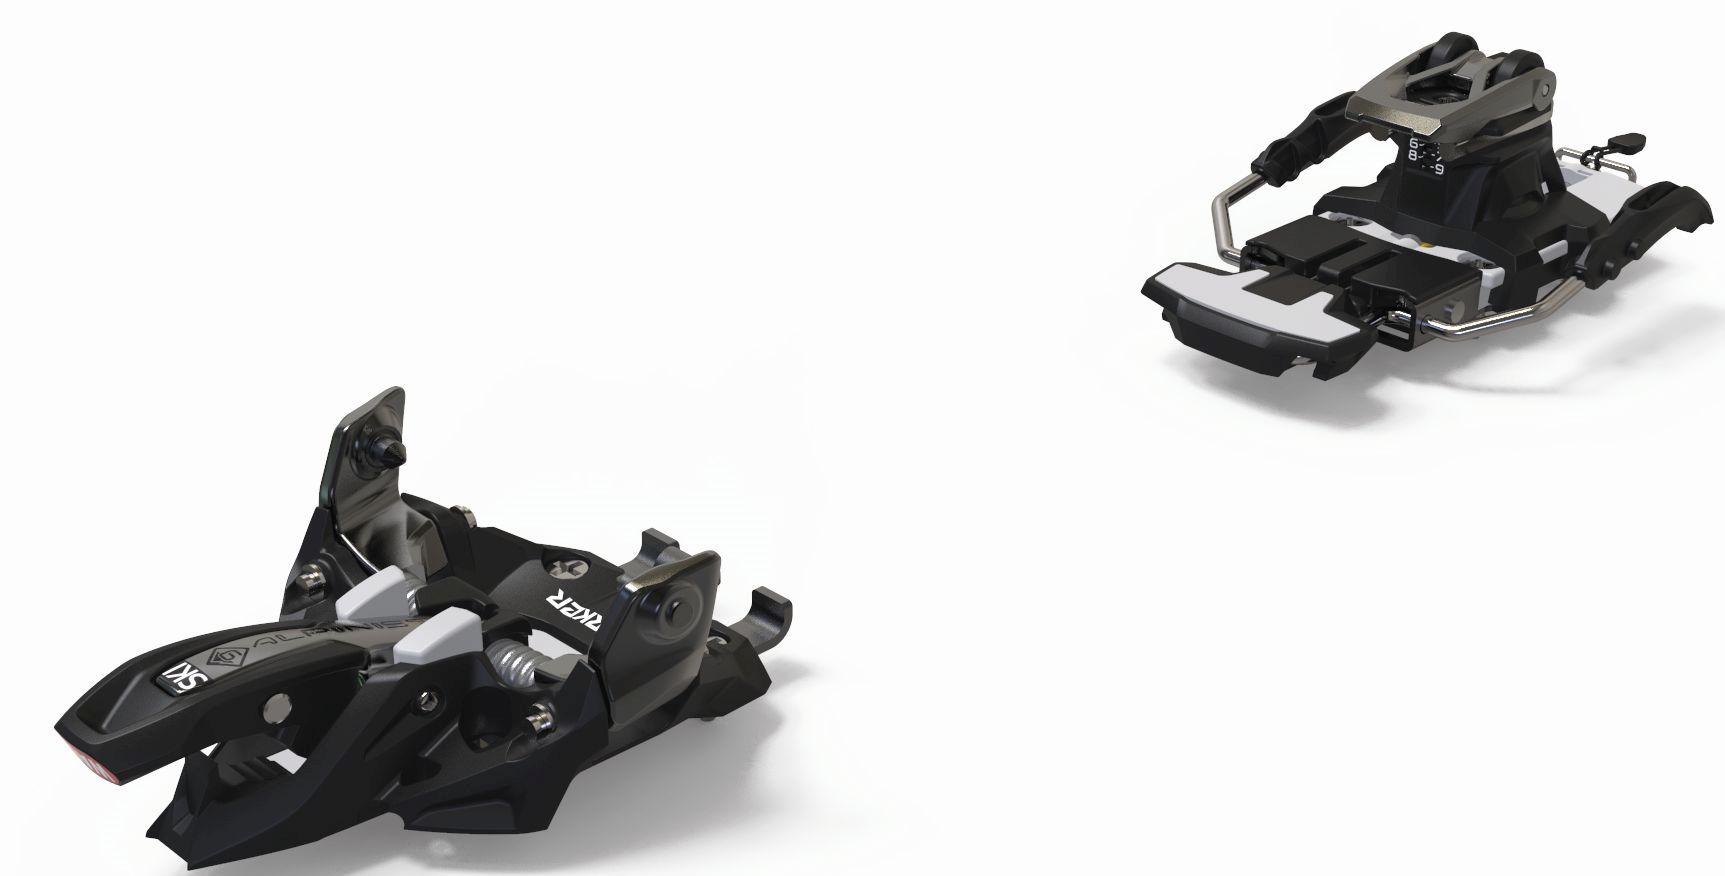 Marker Alpinist 9 Long Travel - black/titanium 90mm